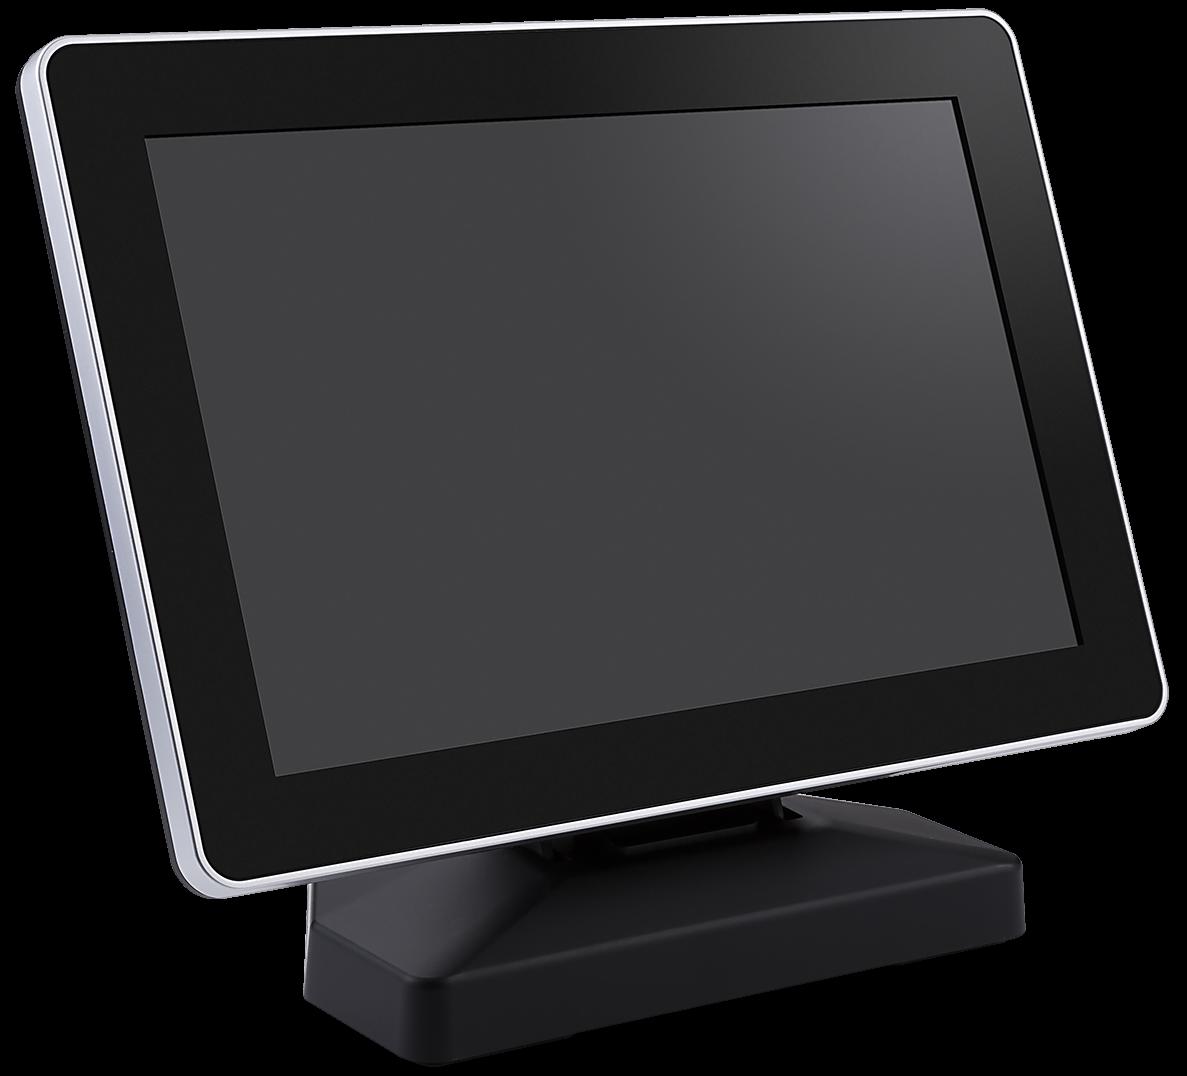 ASUS Hangouts Meet hardware kit-Touchscreen